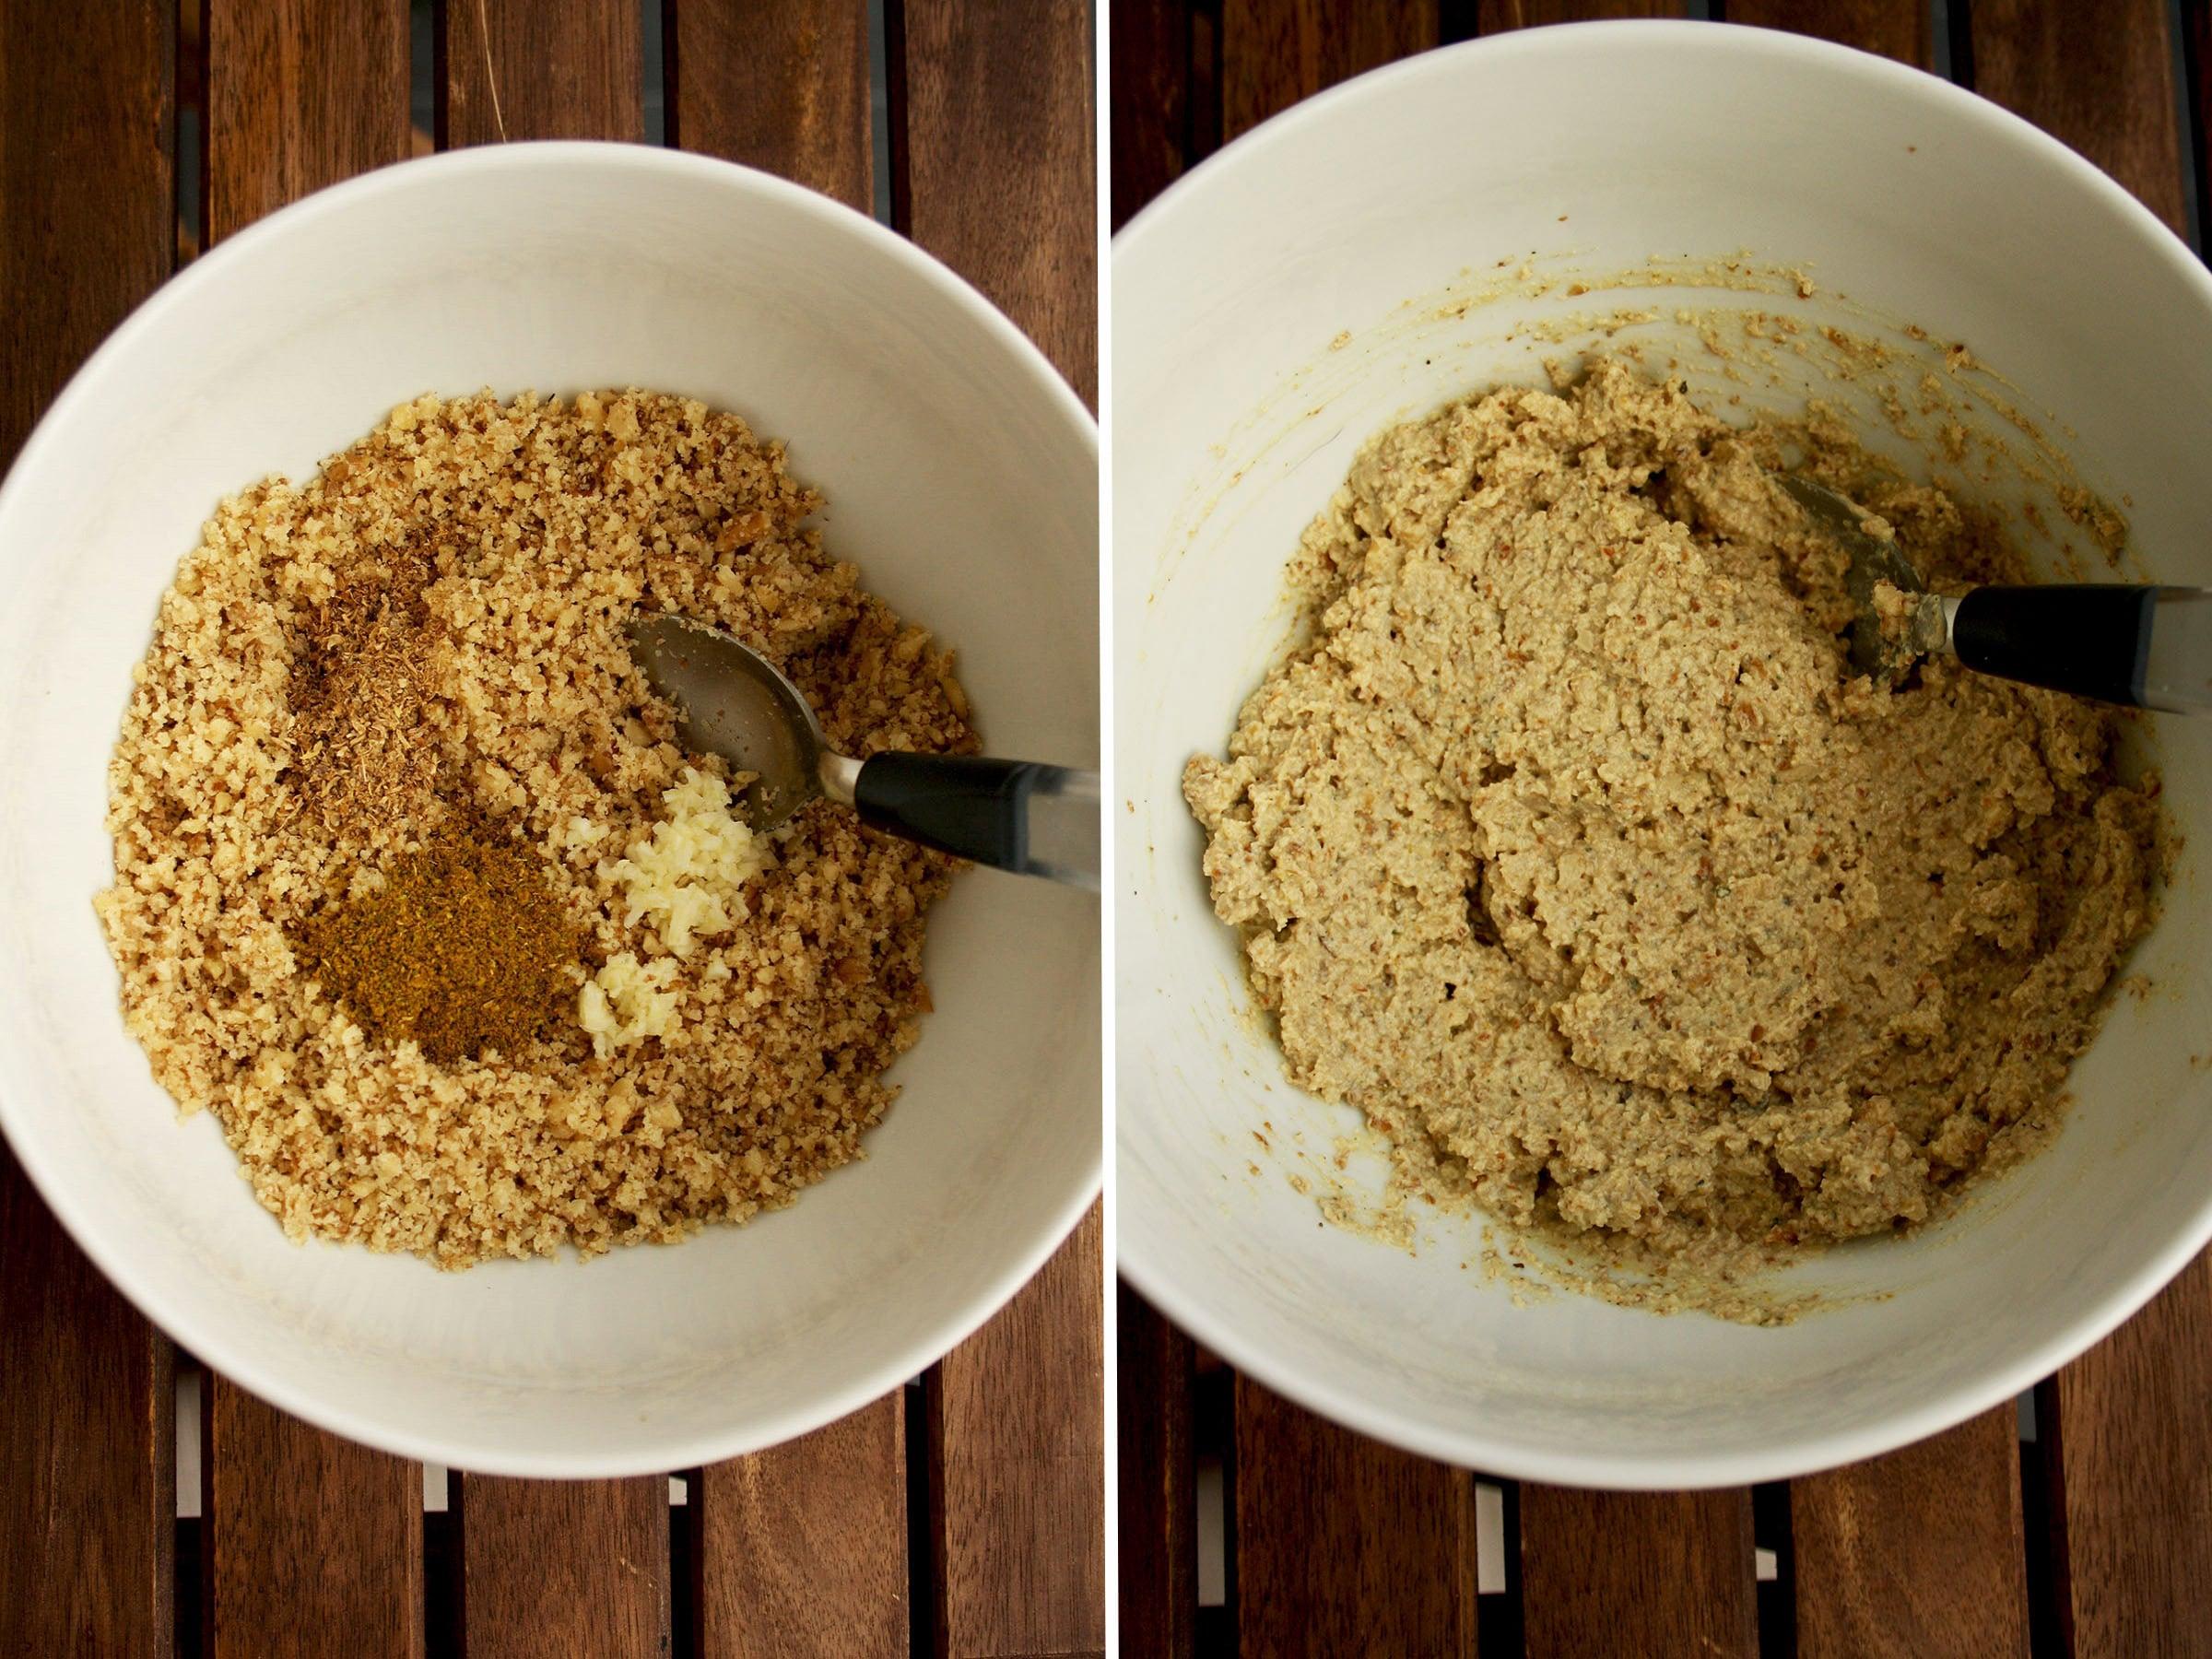 Process Shot of Making Walnut Filling for Eggplant Rolls.